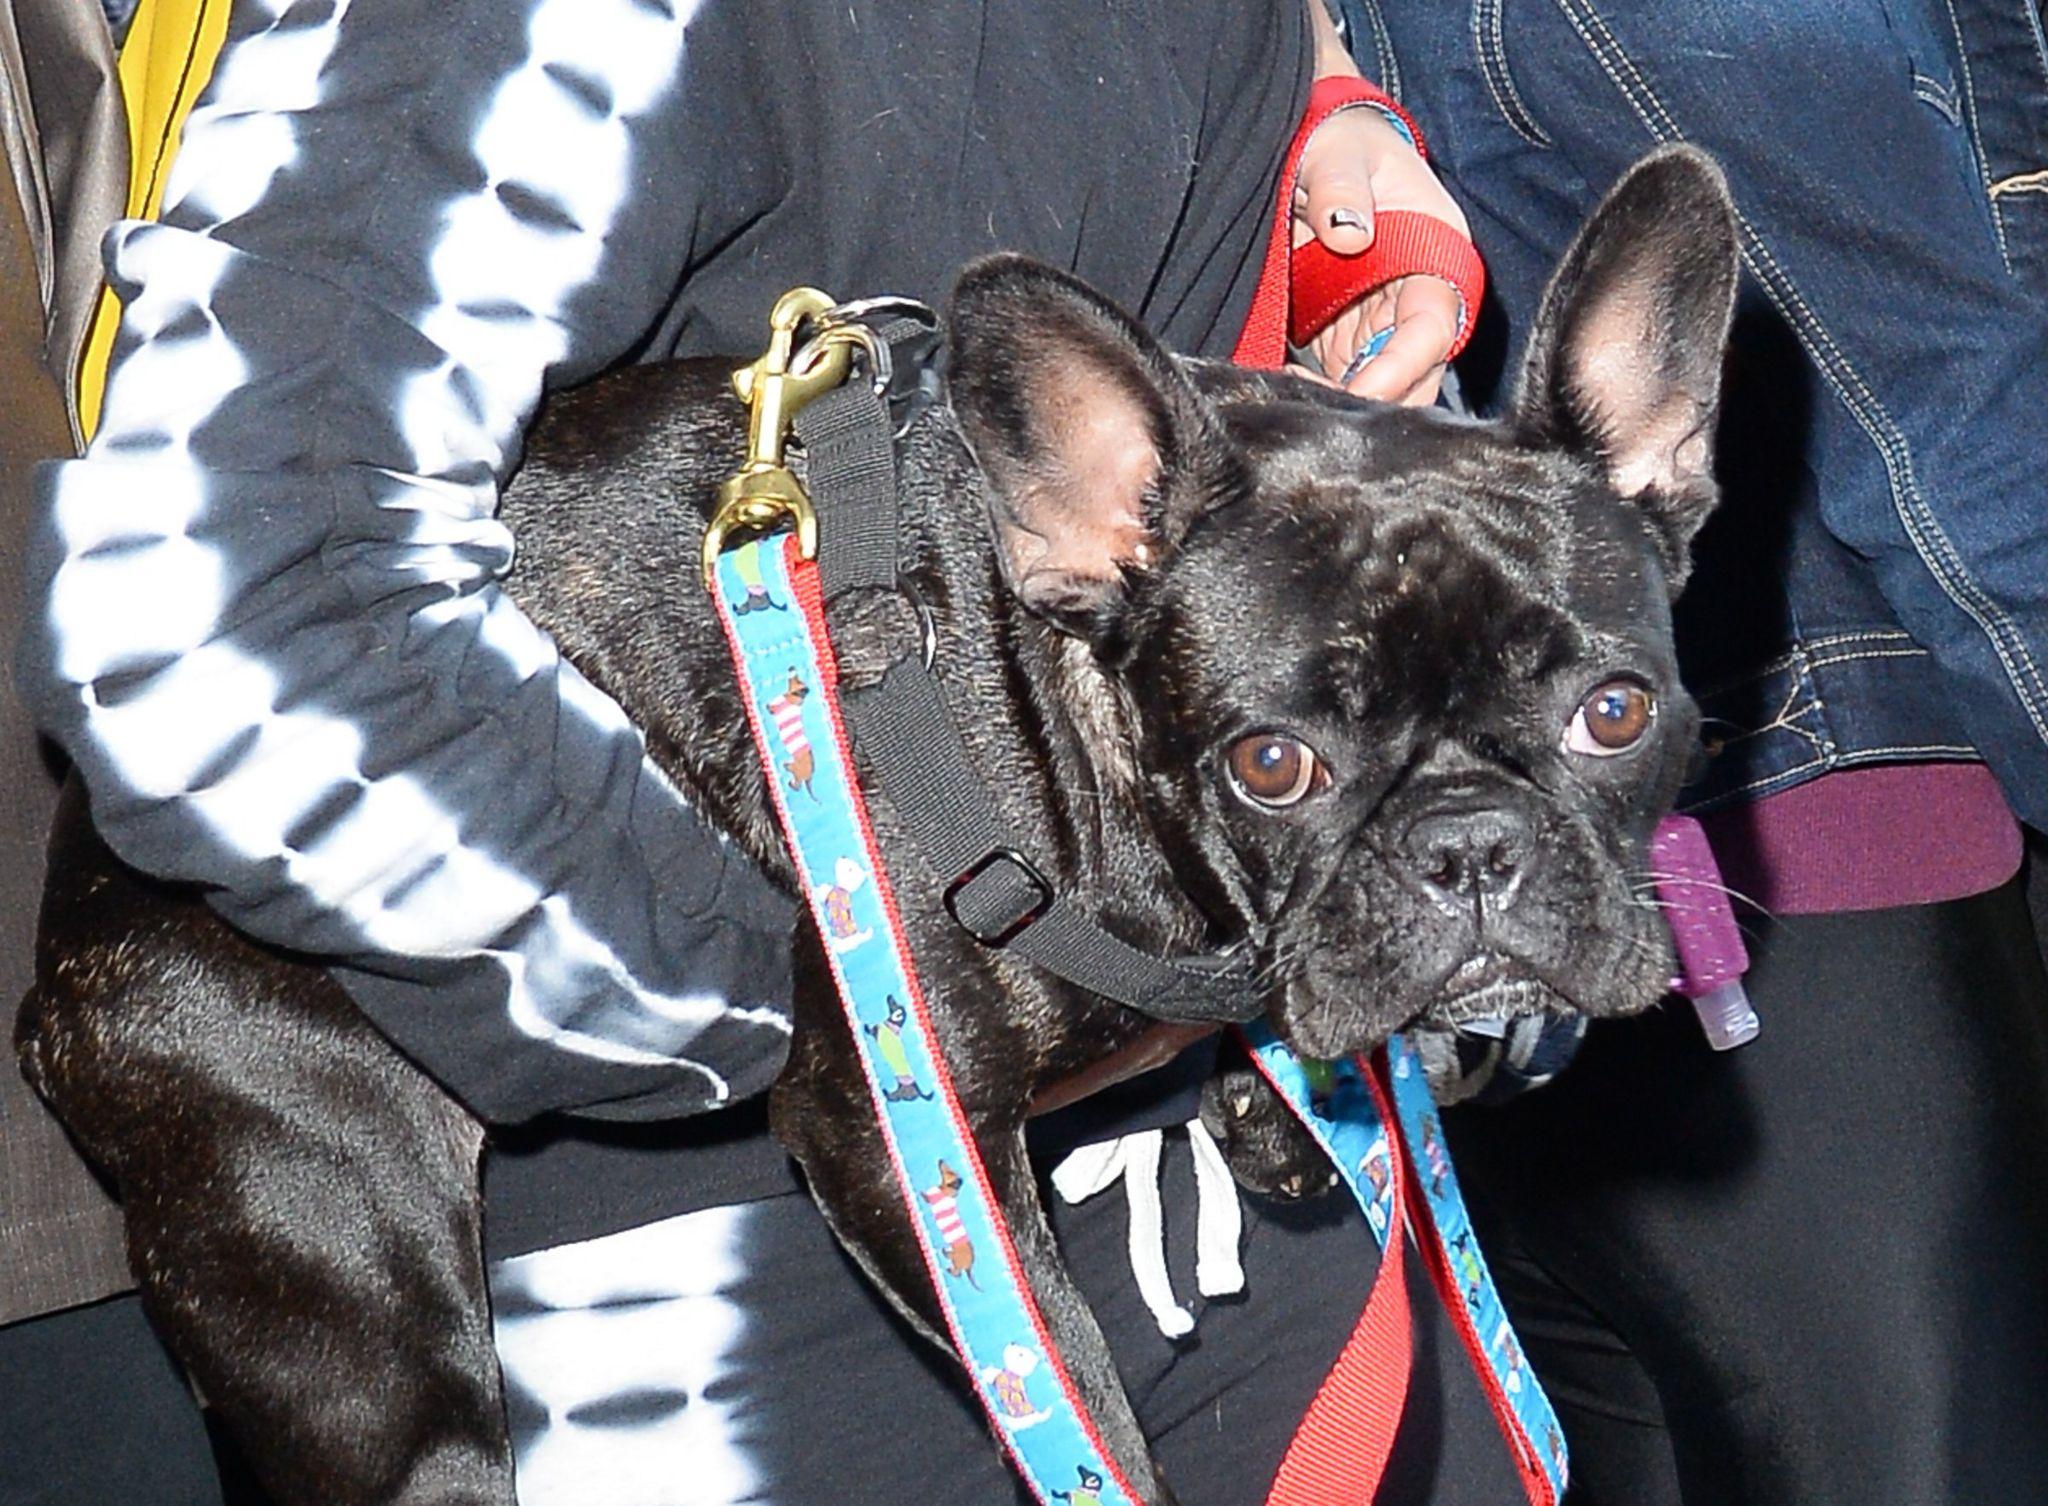 Lady Gaga's dog Miss Asia